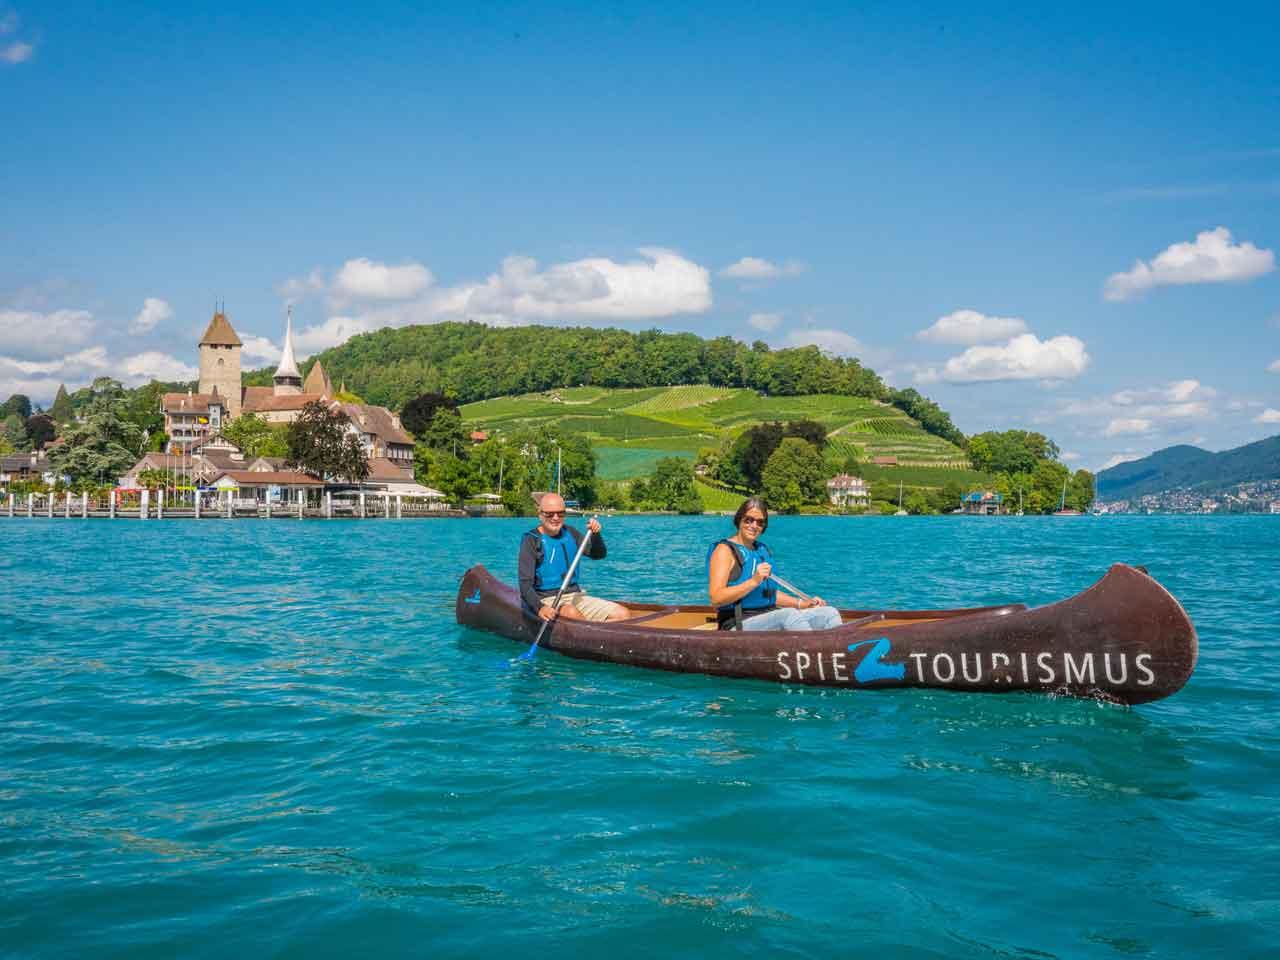 Kanuweg Thunersee – aktive Erholung für jedermann